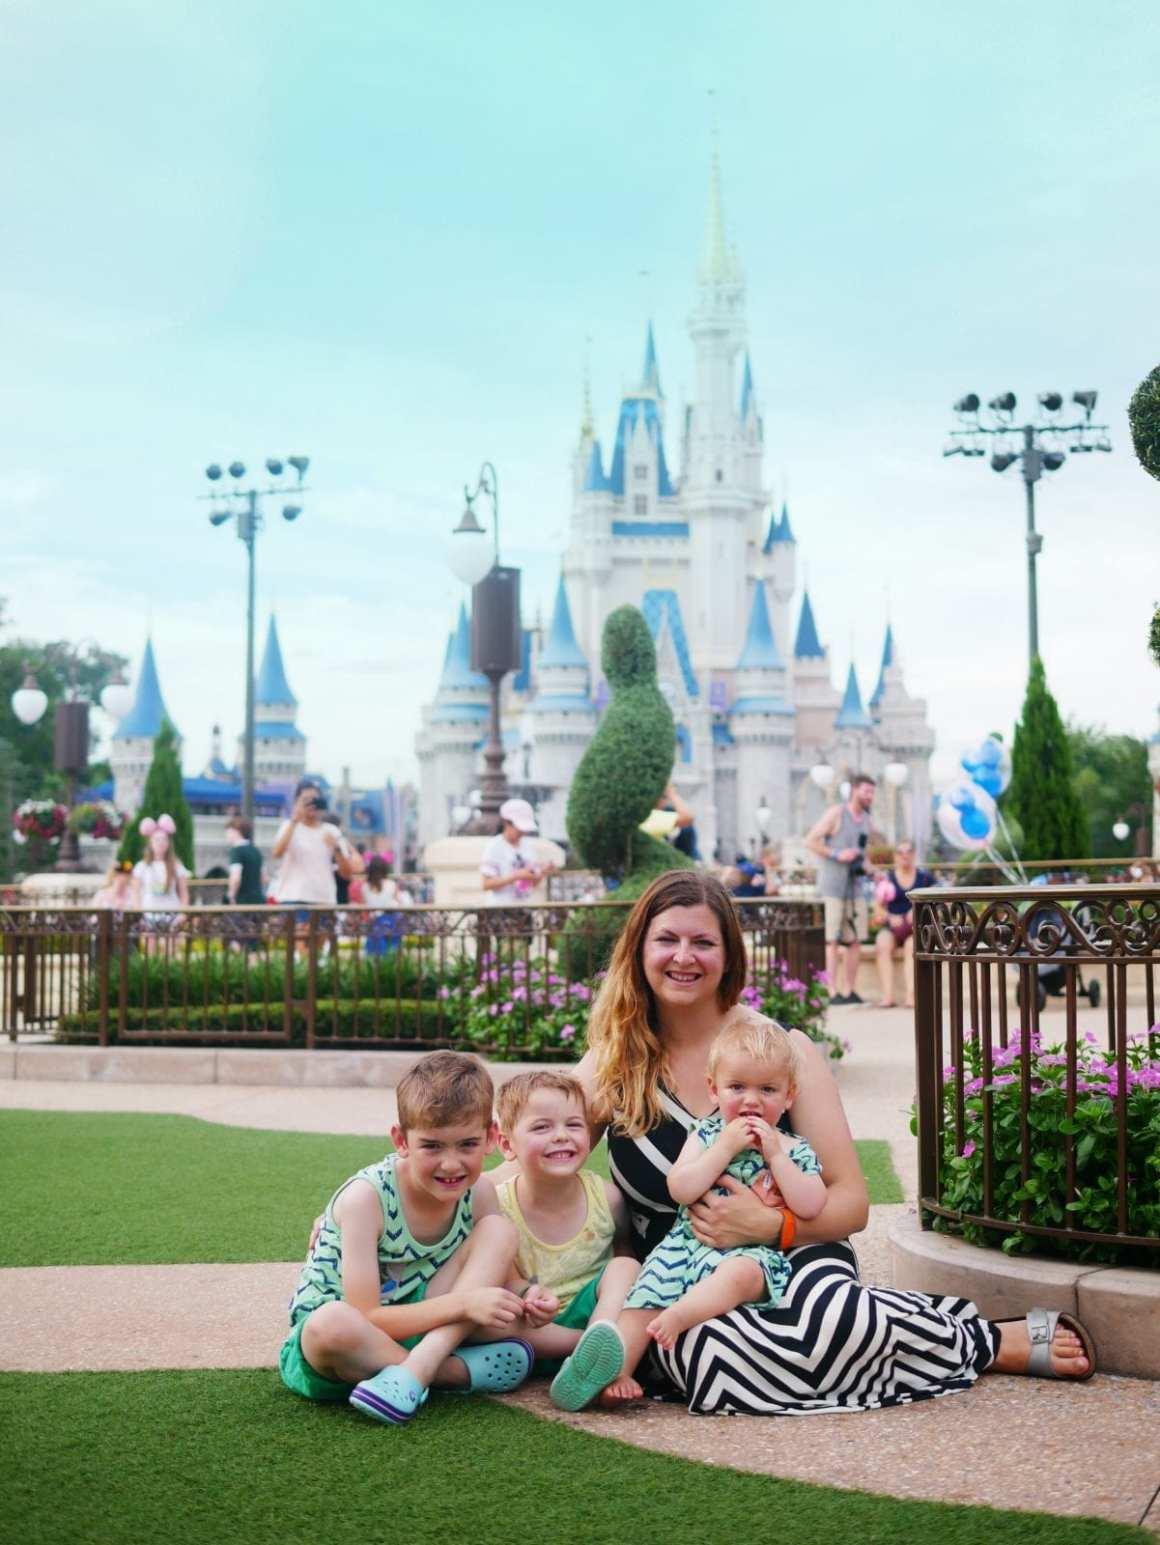 Magic Kingdom Cinderella's castle